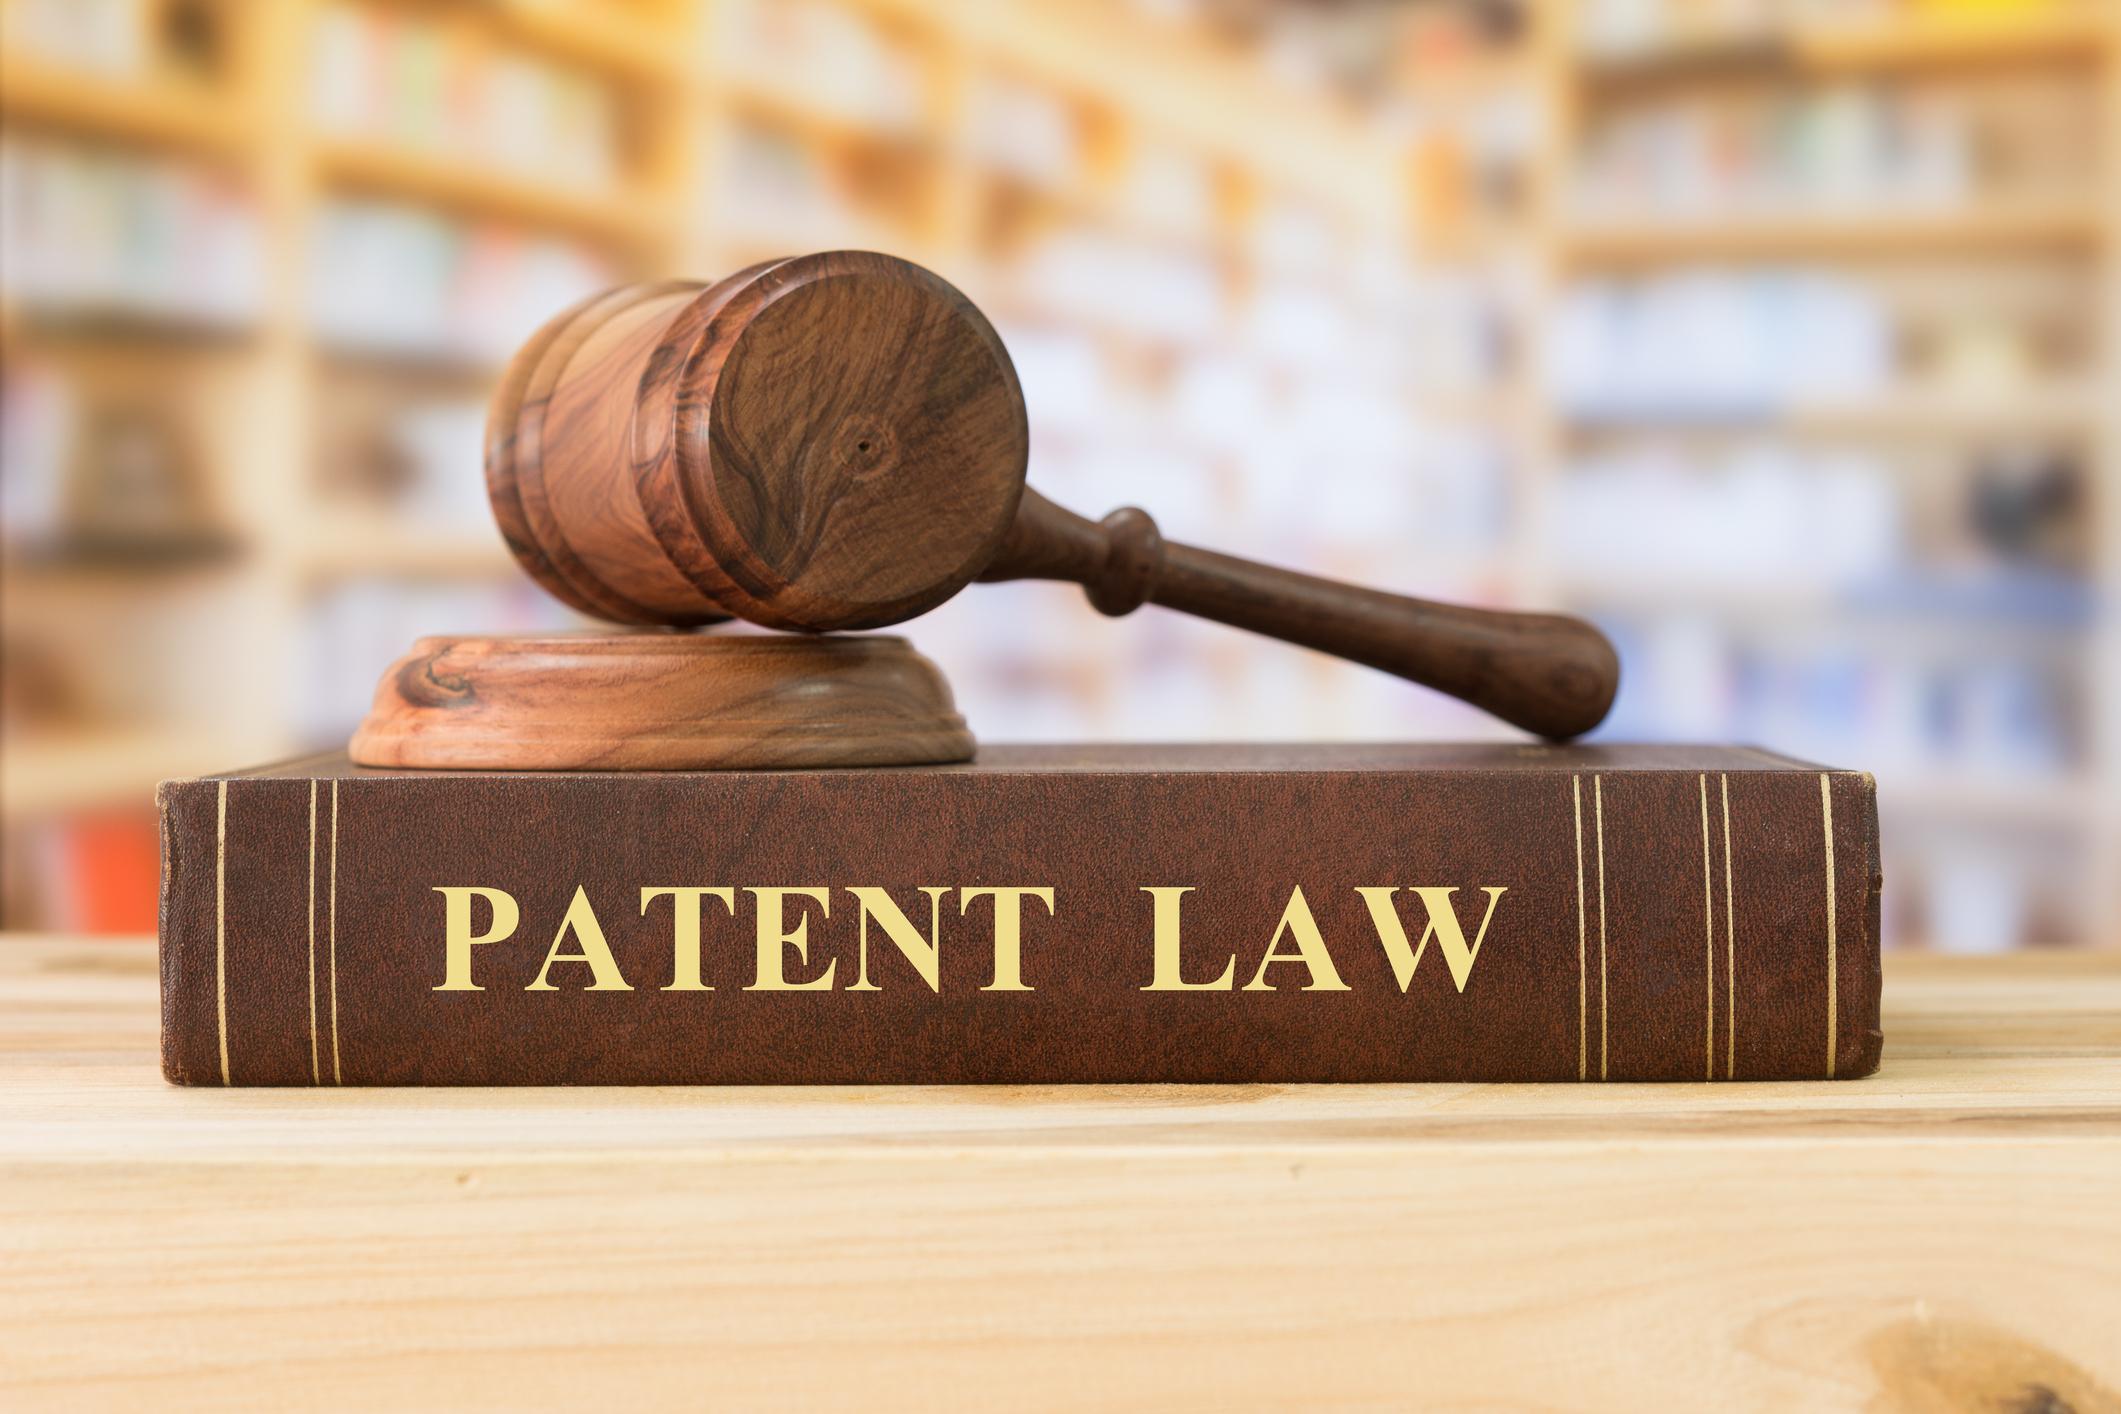 3 Questions For Patent Professor And Engineer, Saurabh Vishnubhakat